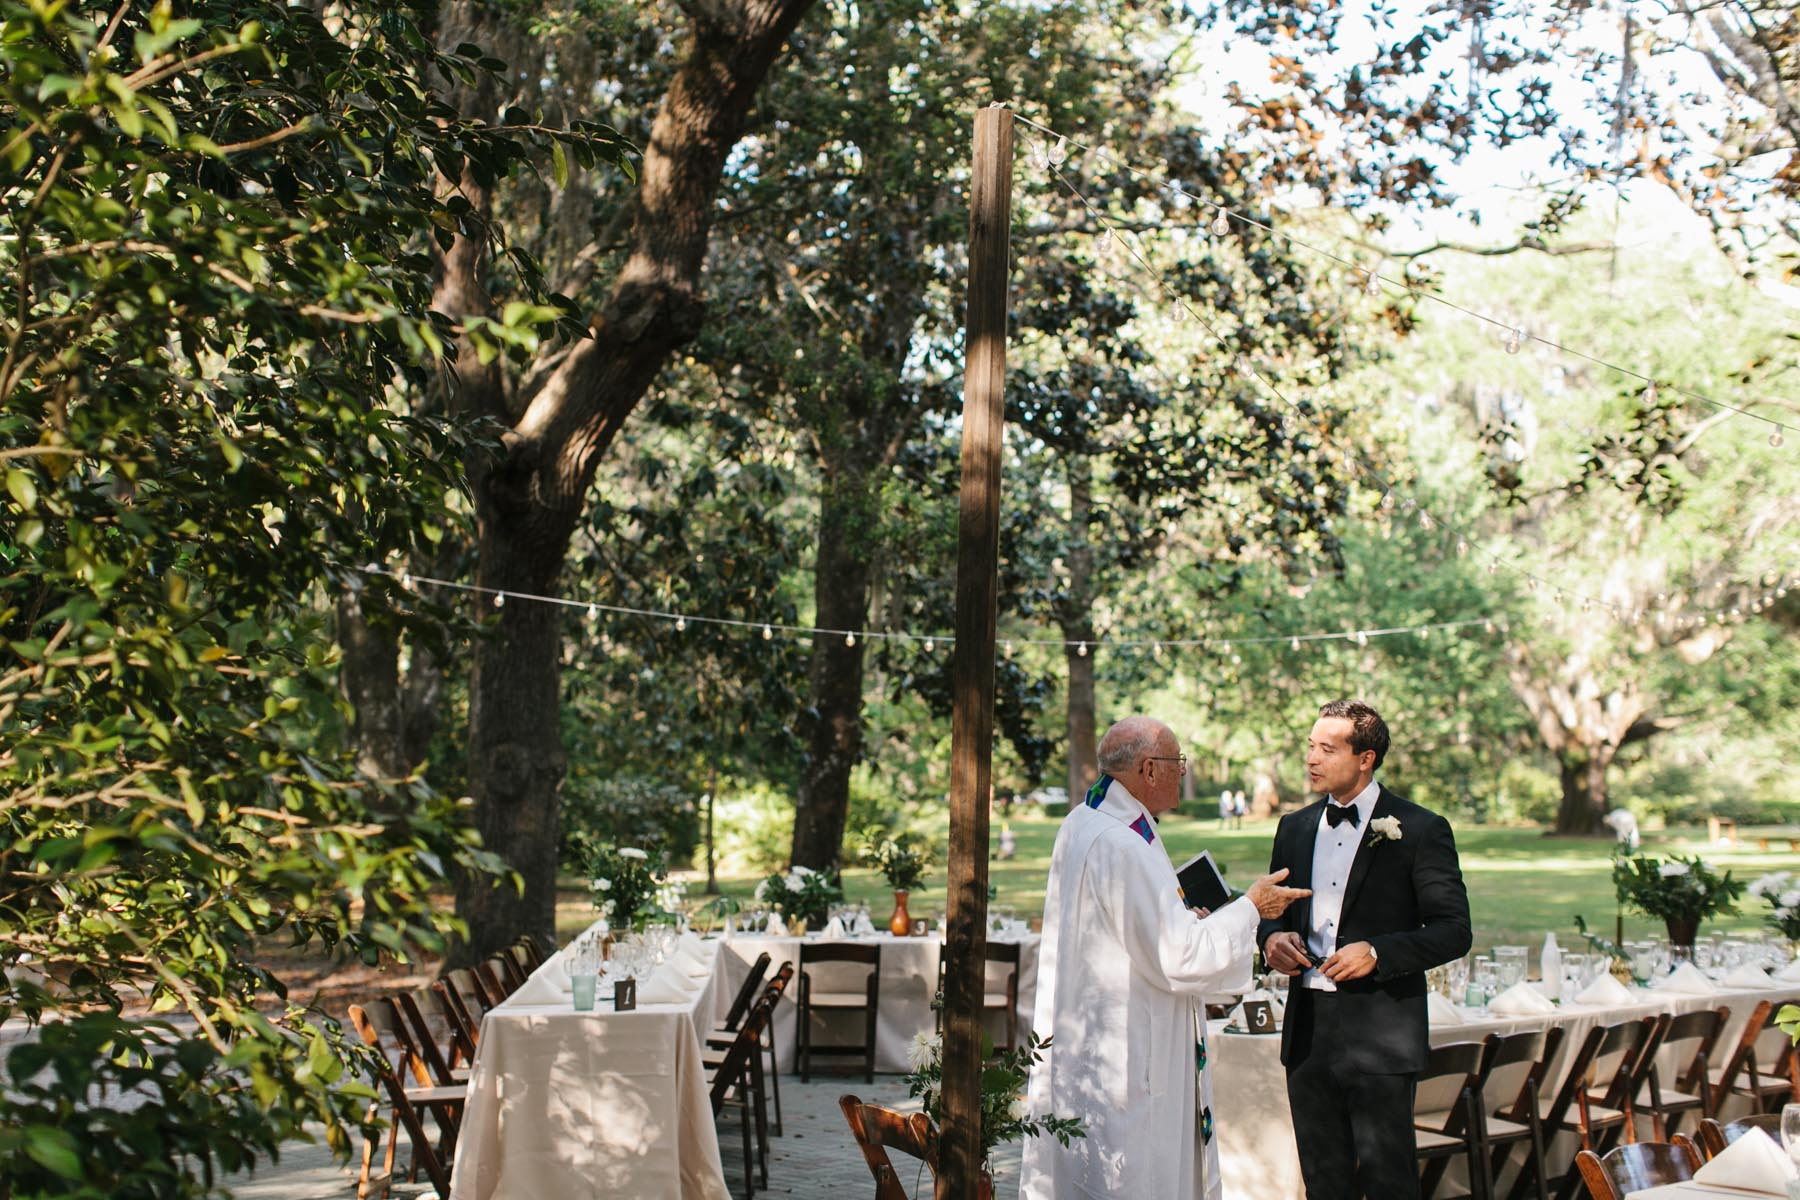 lowry wedding blog eden garden florida wedding-55